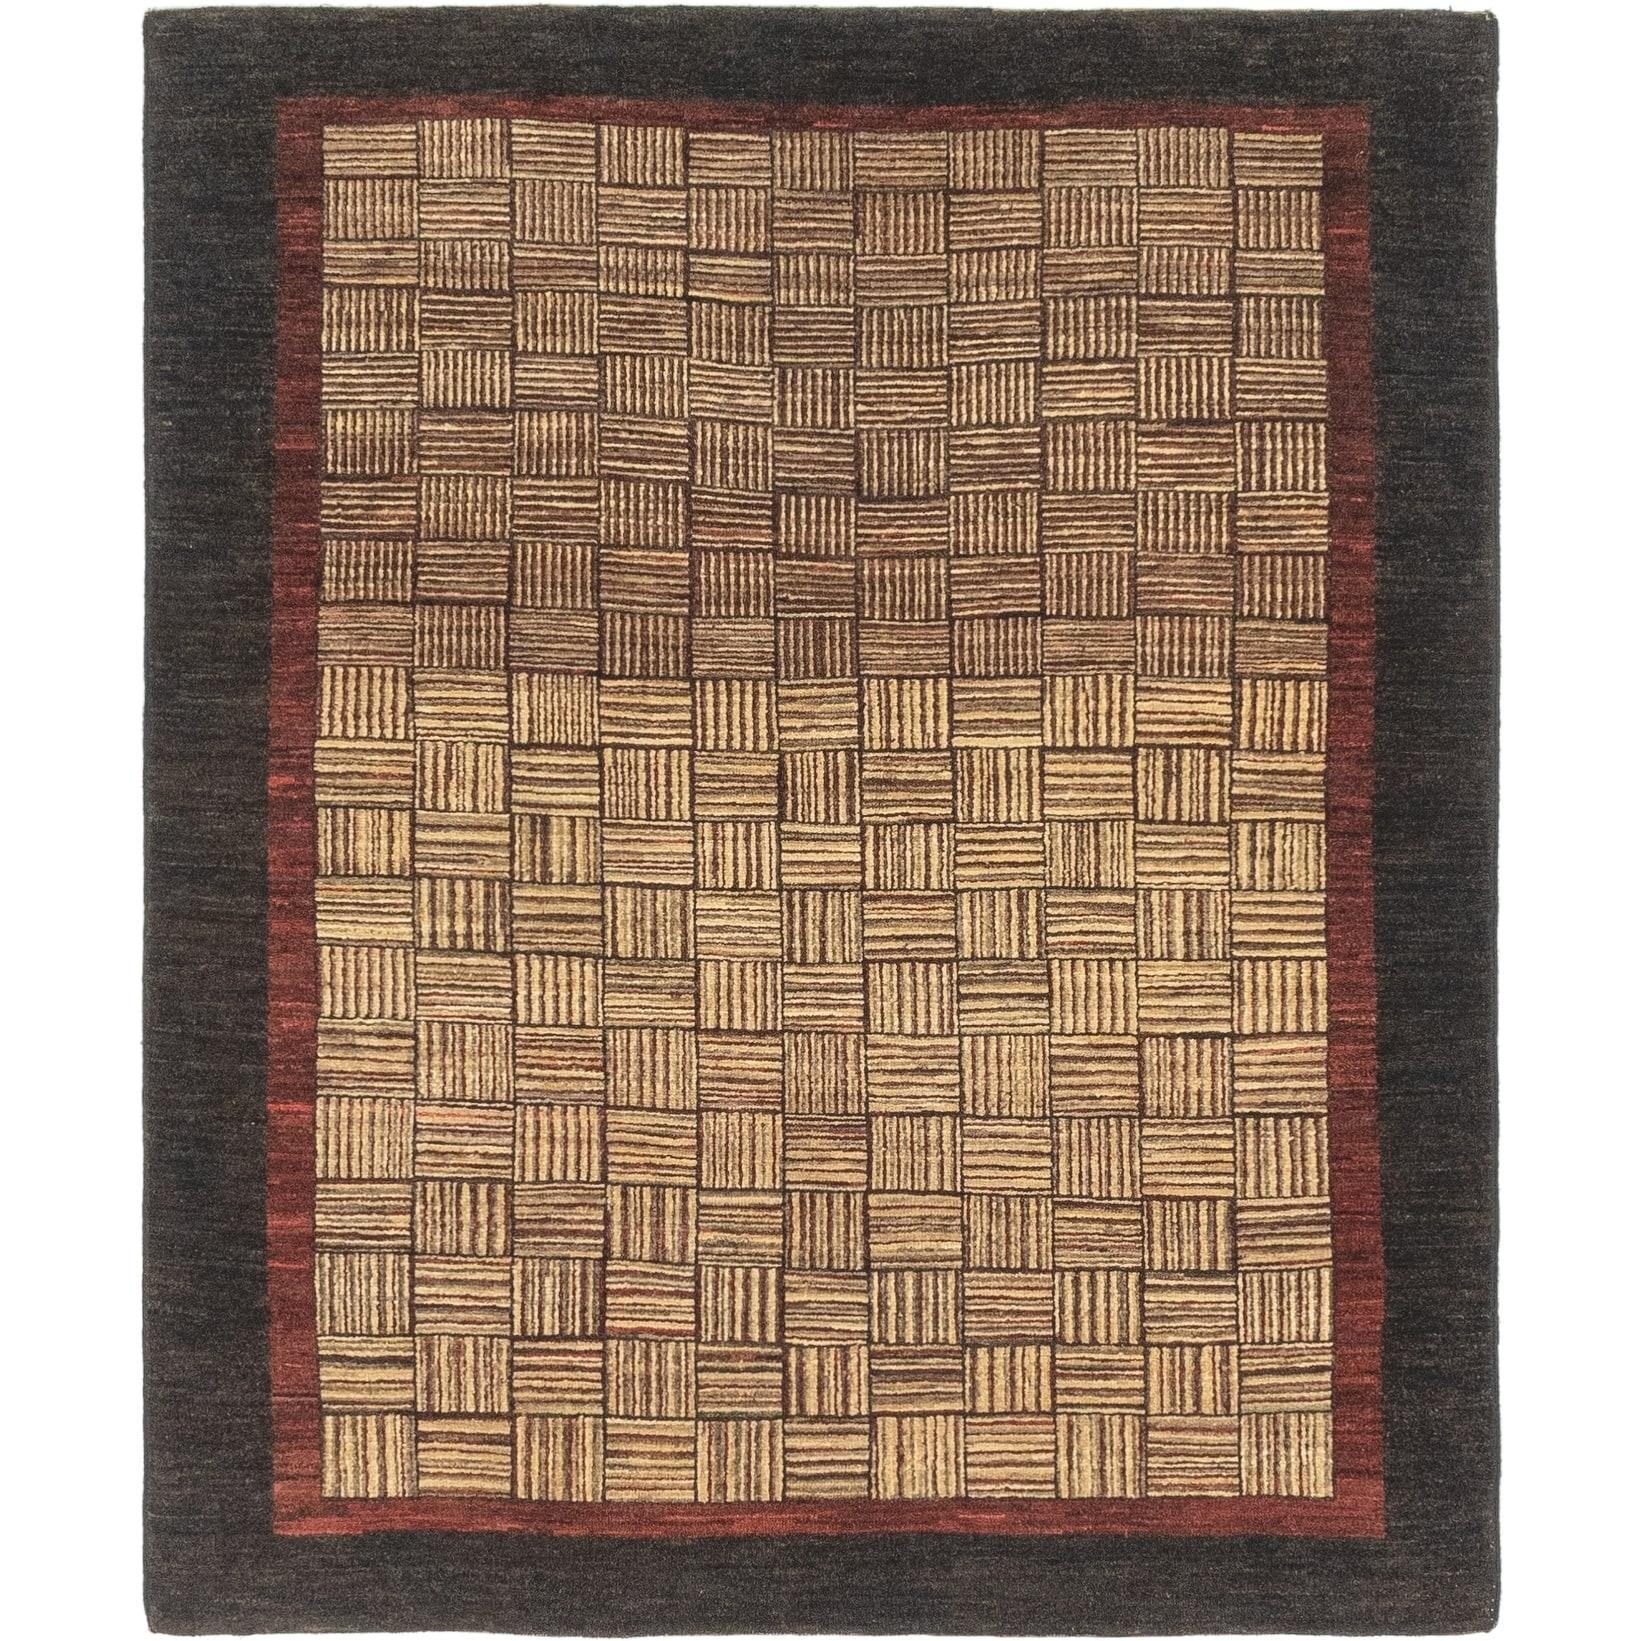 Hand Knotted Kashkuli Gabbeh Wool Area Rug - 4 9 x 5 10 (Multi - 4 9 x 5 10)